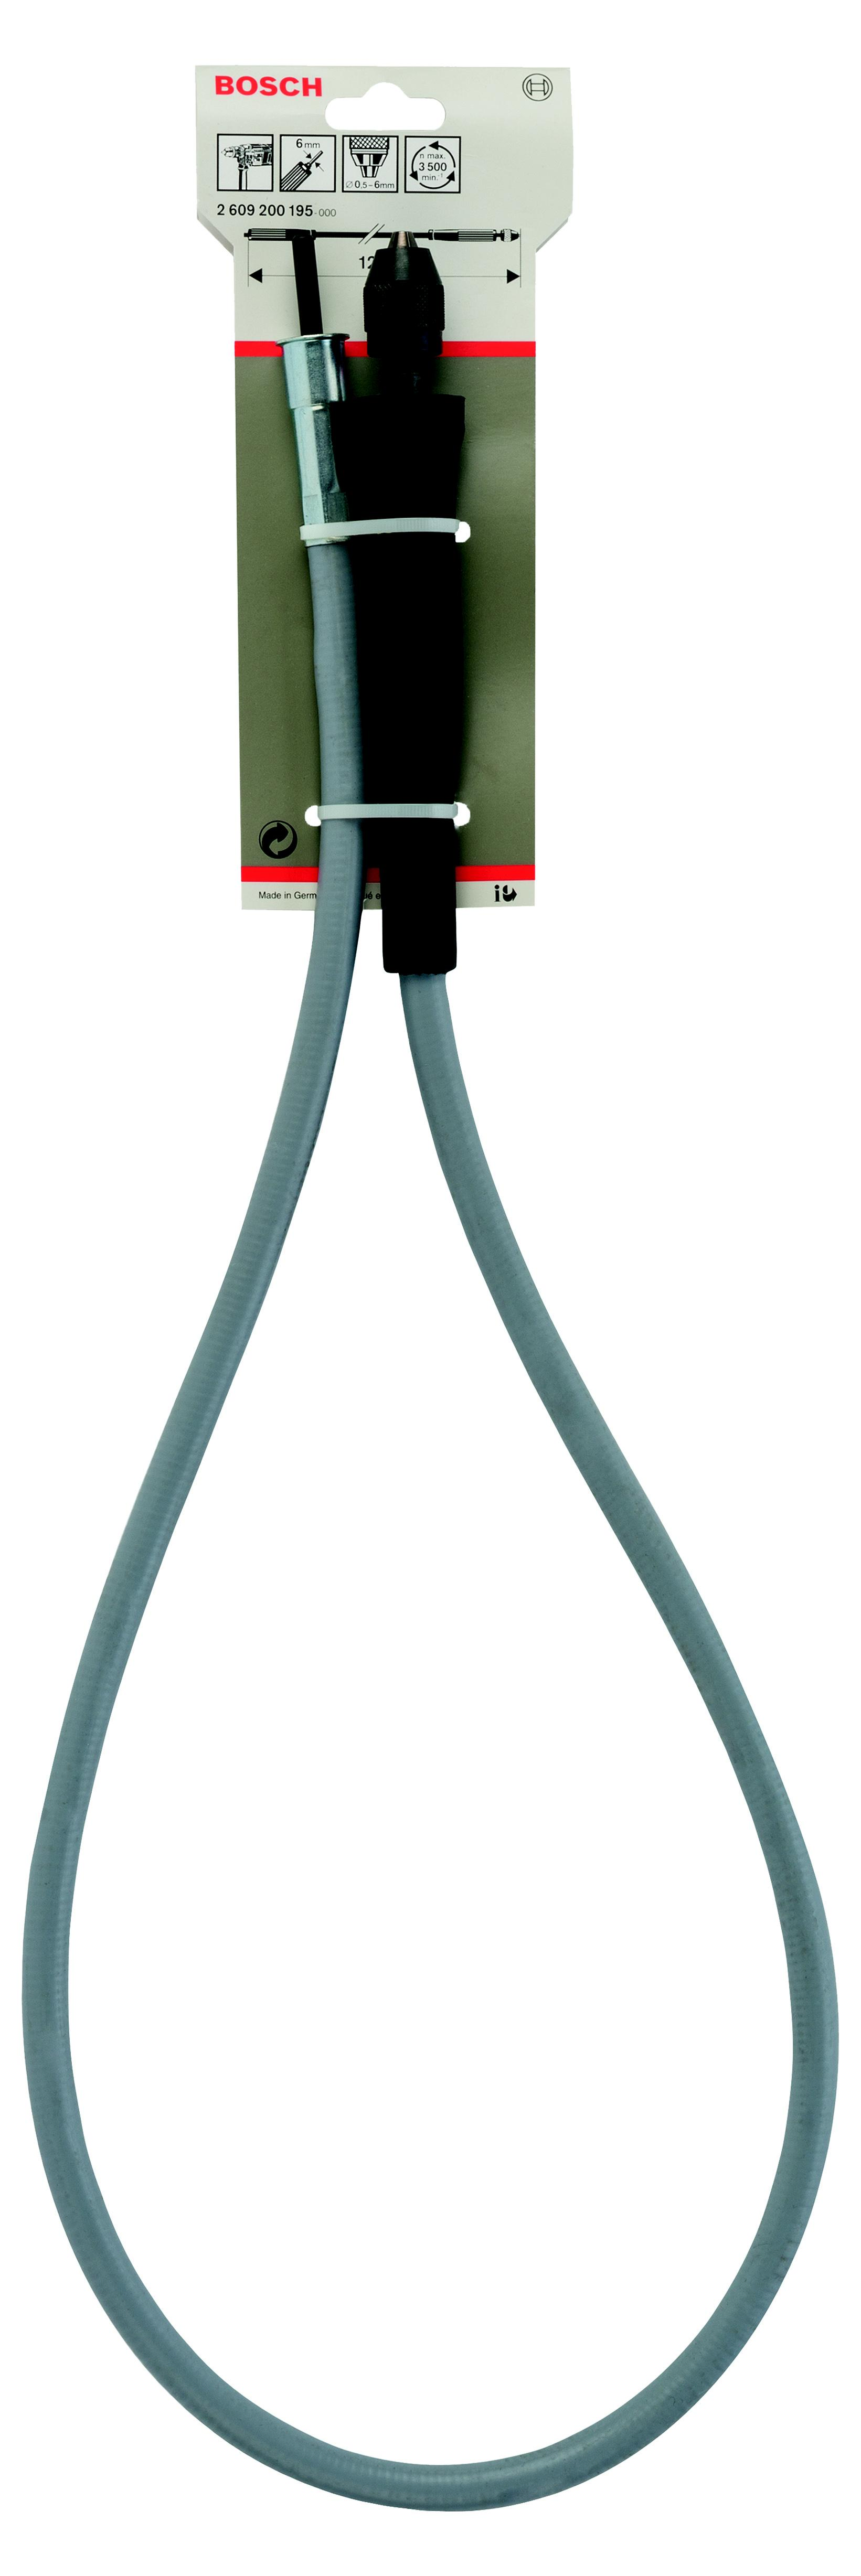 Гибкий вал для дрели Bosch гибкий вал для дрели (2.609.200.195) блокиратор для дверей гибкий мир детства гибкий